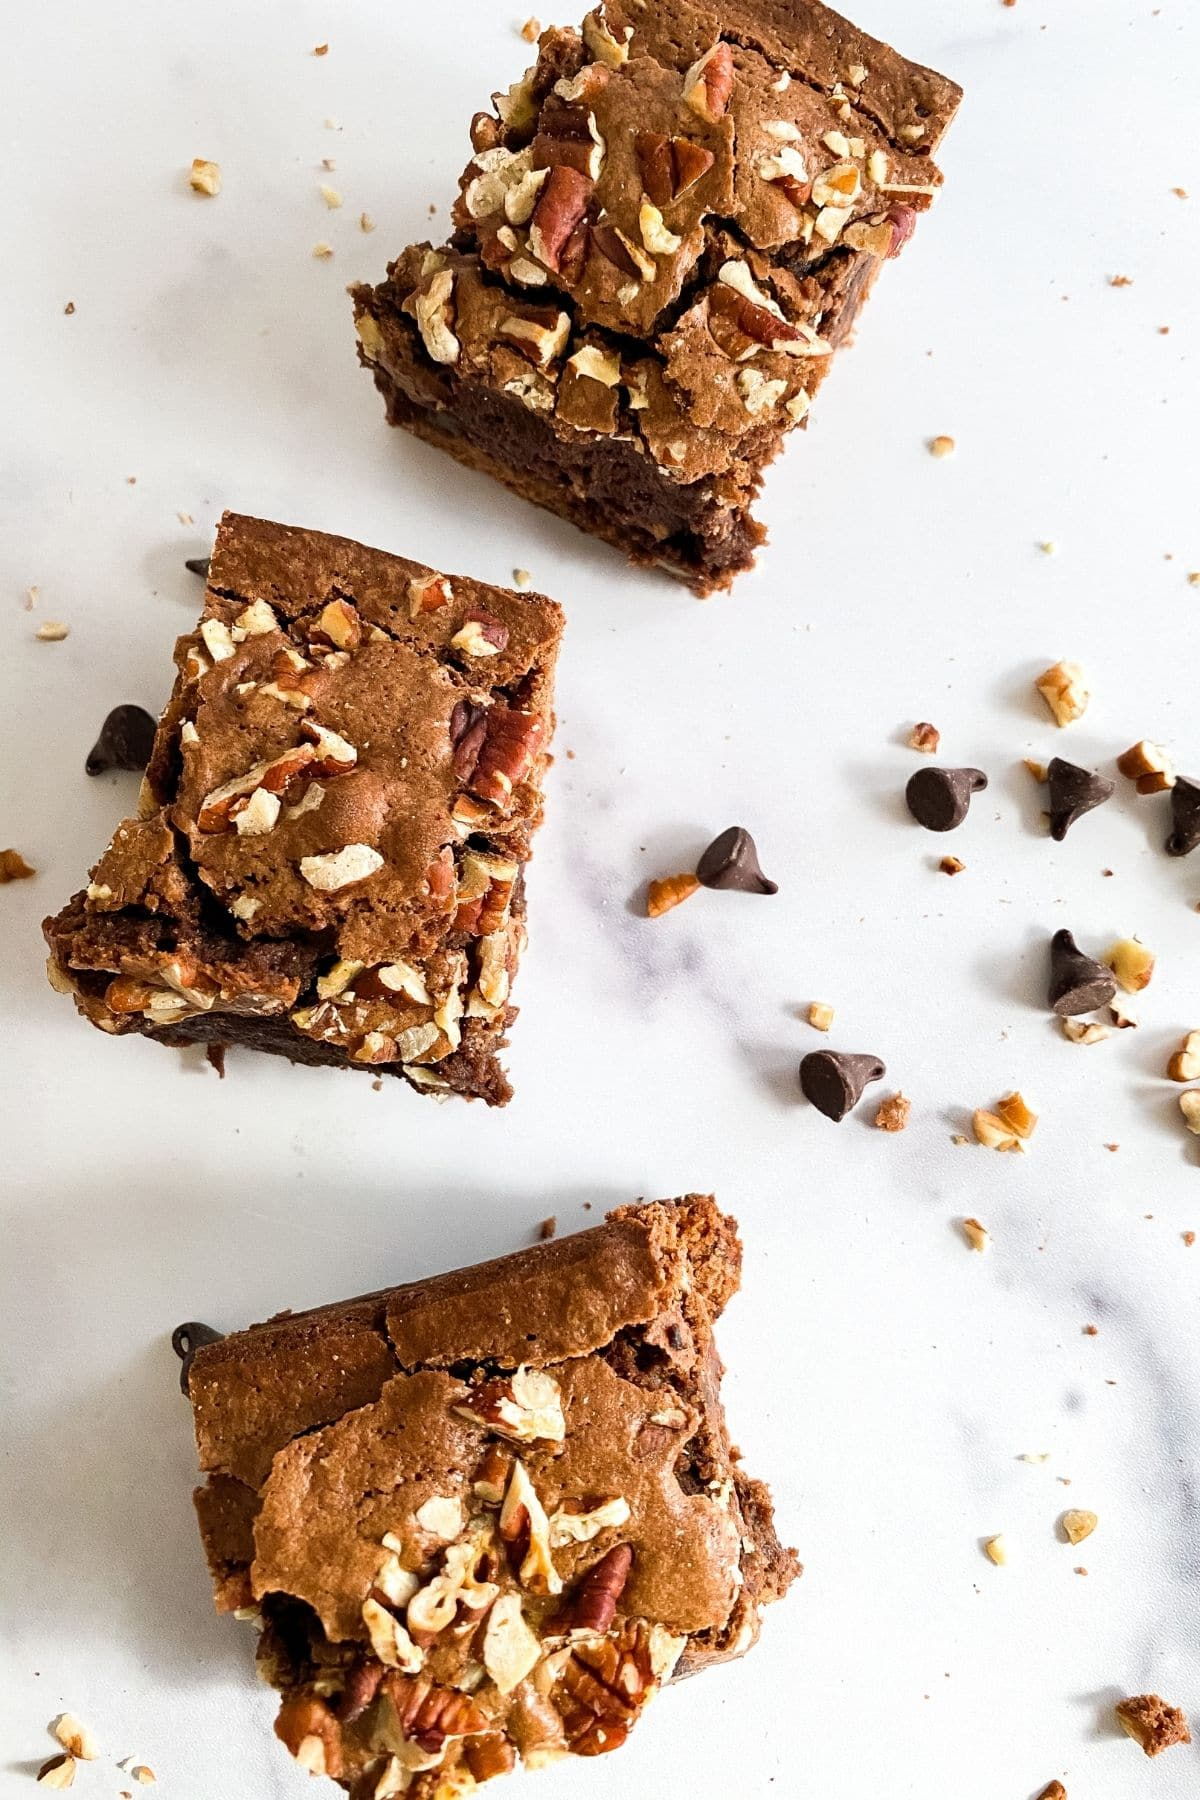 Brownies on table